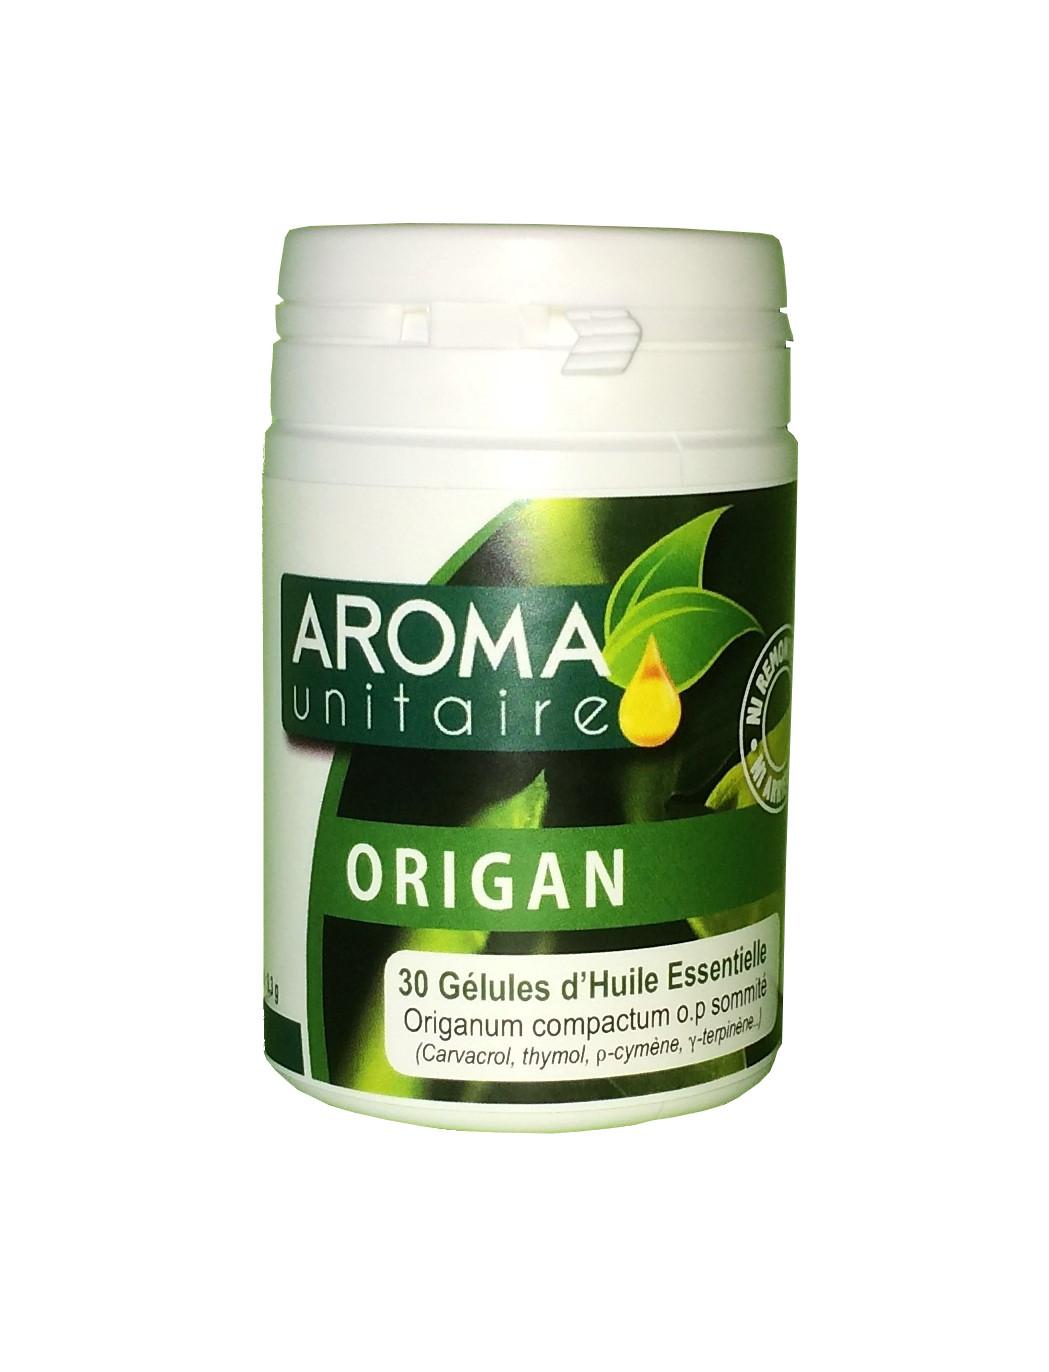 AROMA Origan - Pharmacie de la Croix Verte - Herboristerie